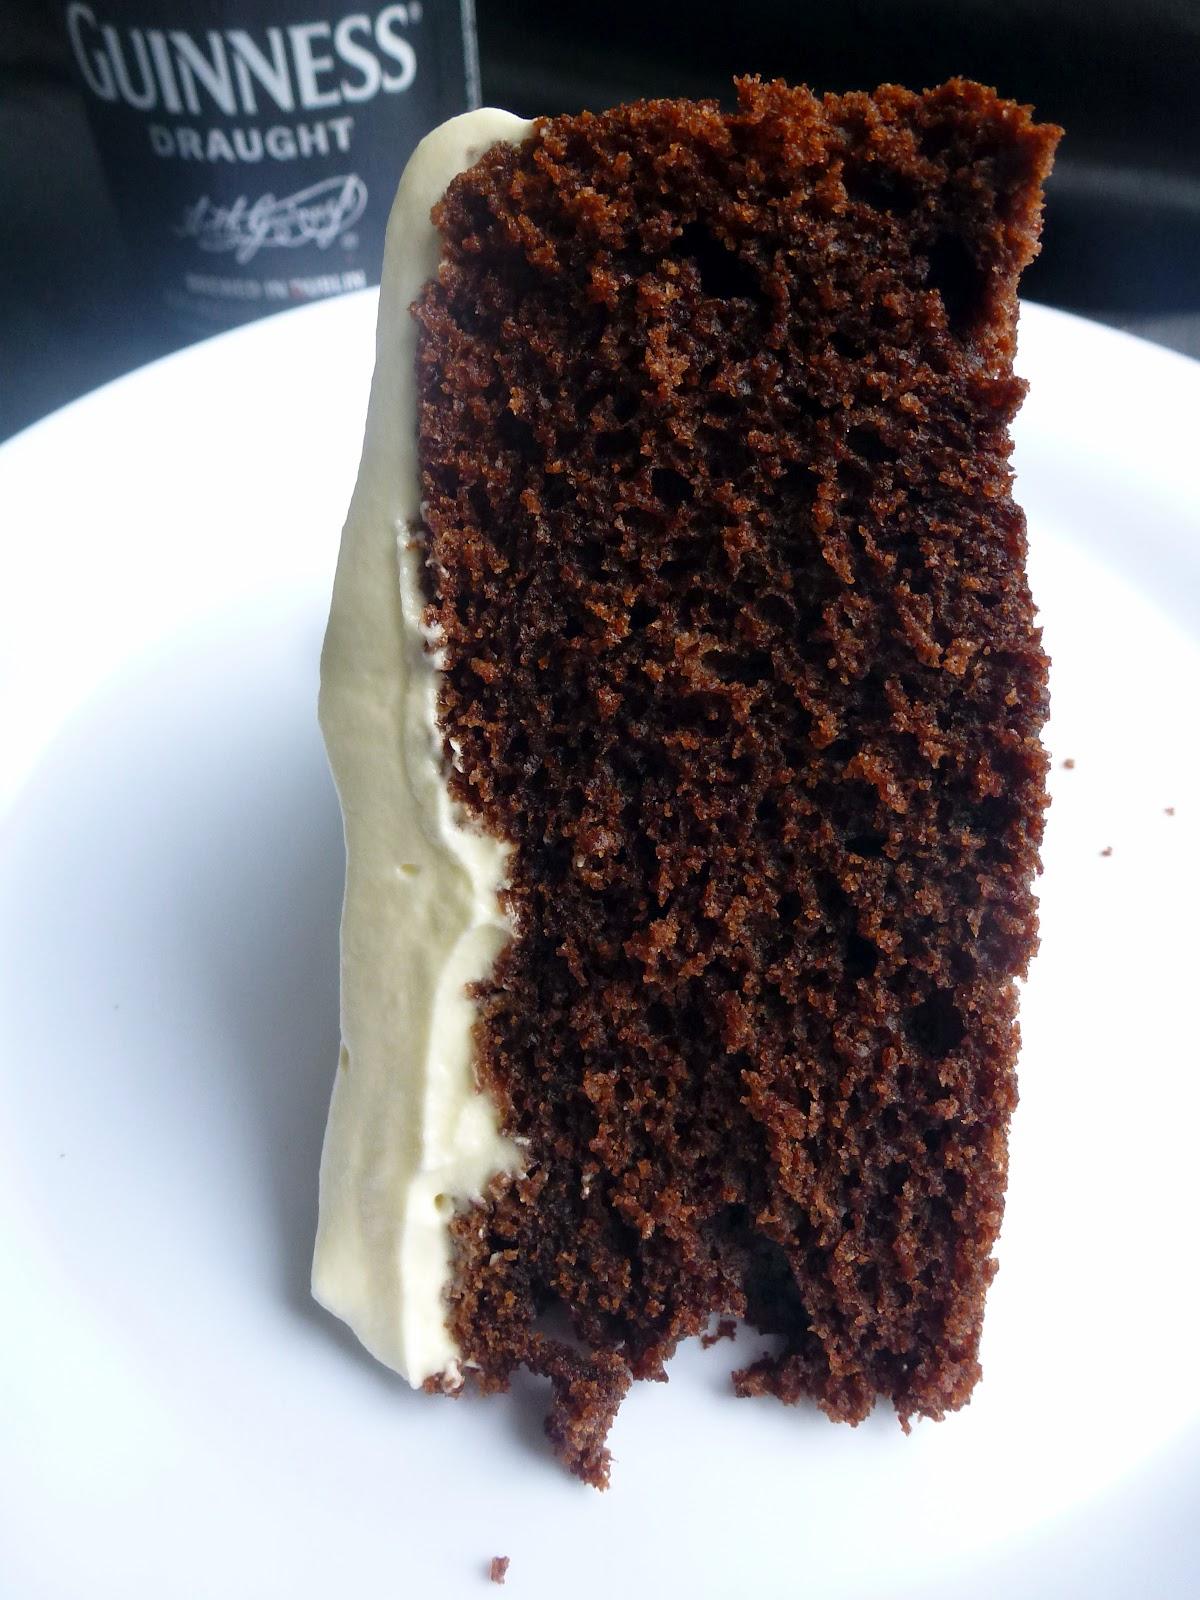 Double Dark Chocolate Stout Beer Cake